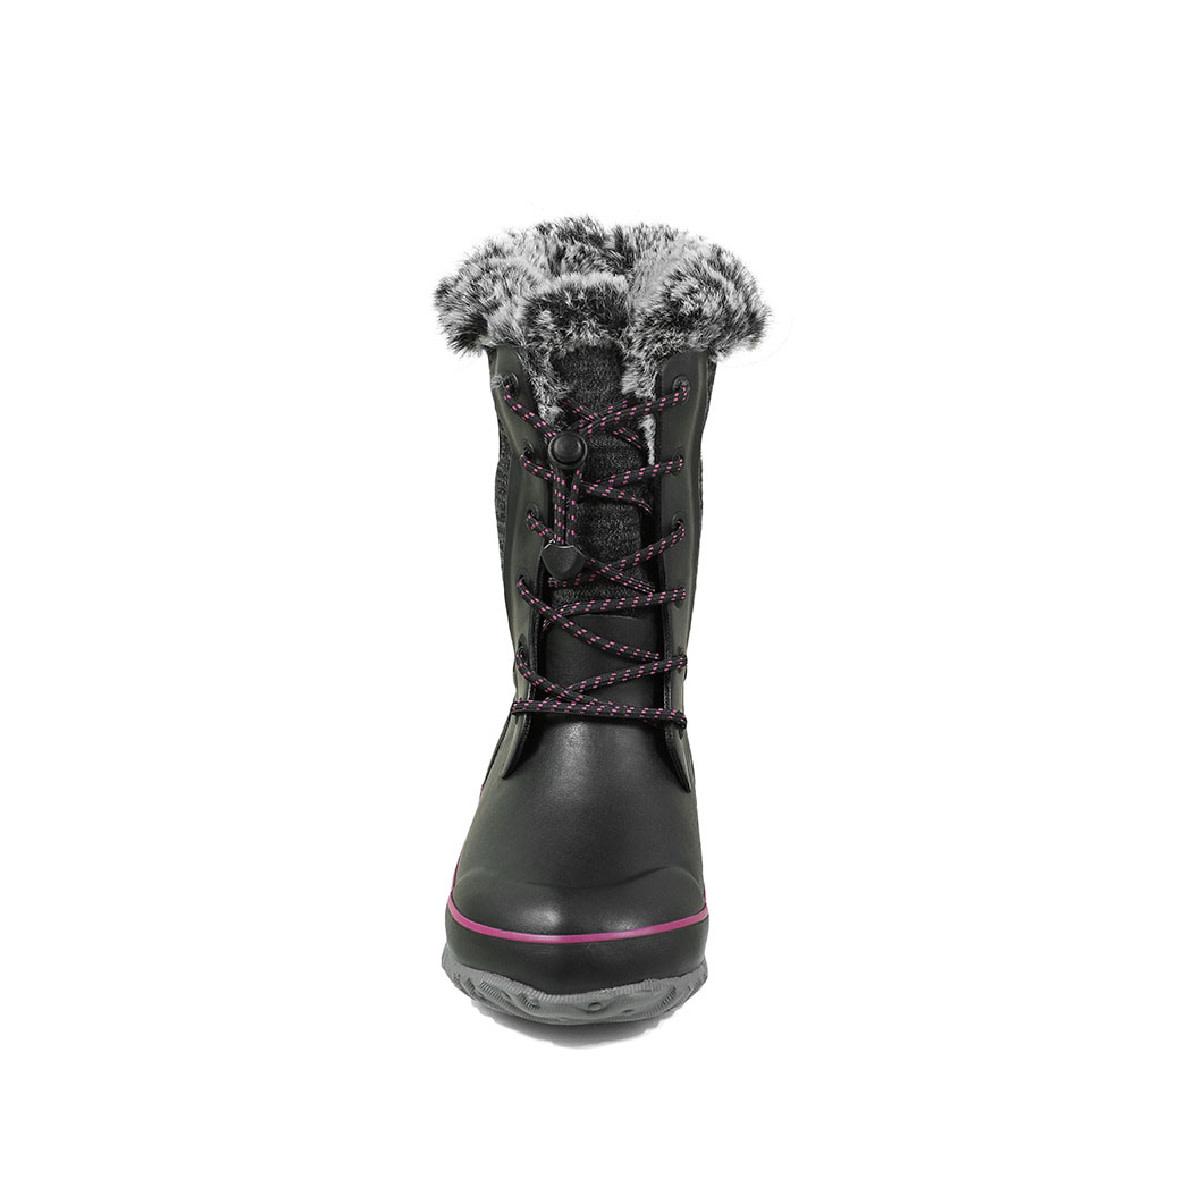 BOGS BOGS Kid's Arcata Knit Black